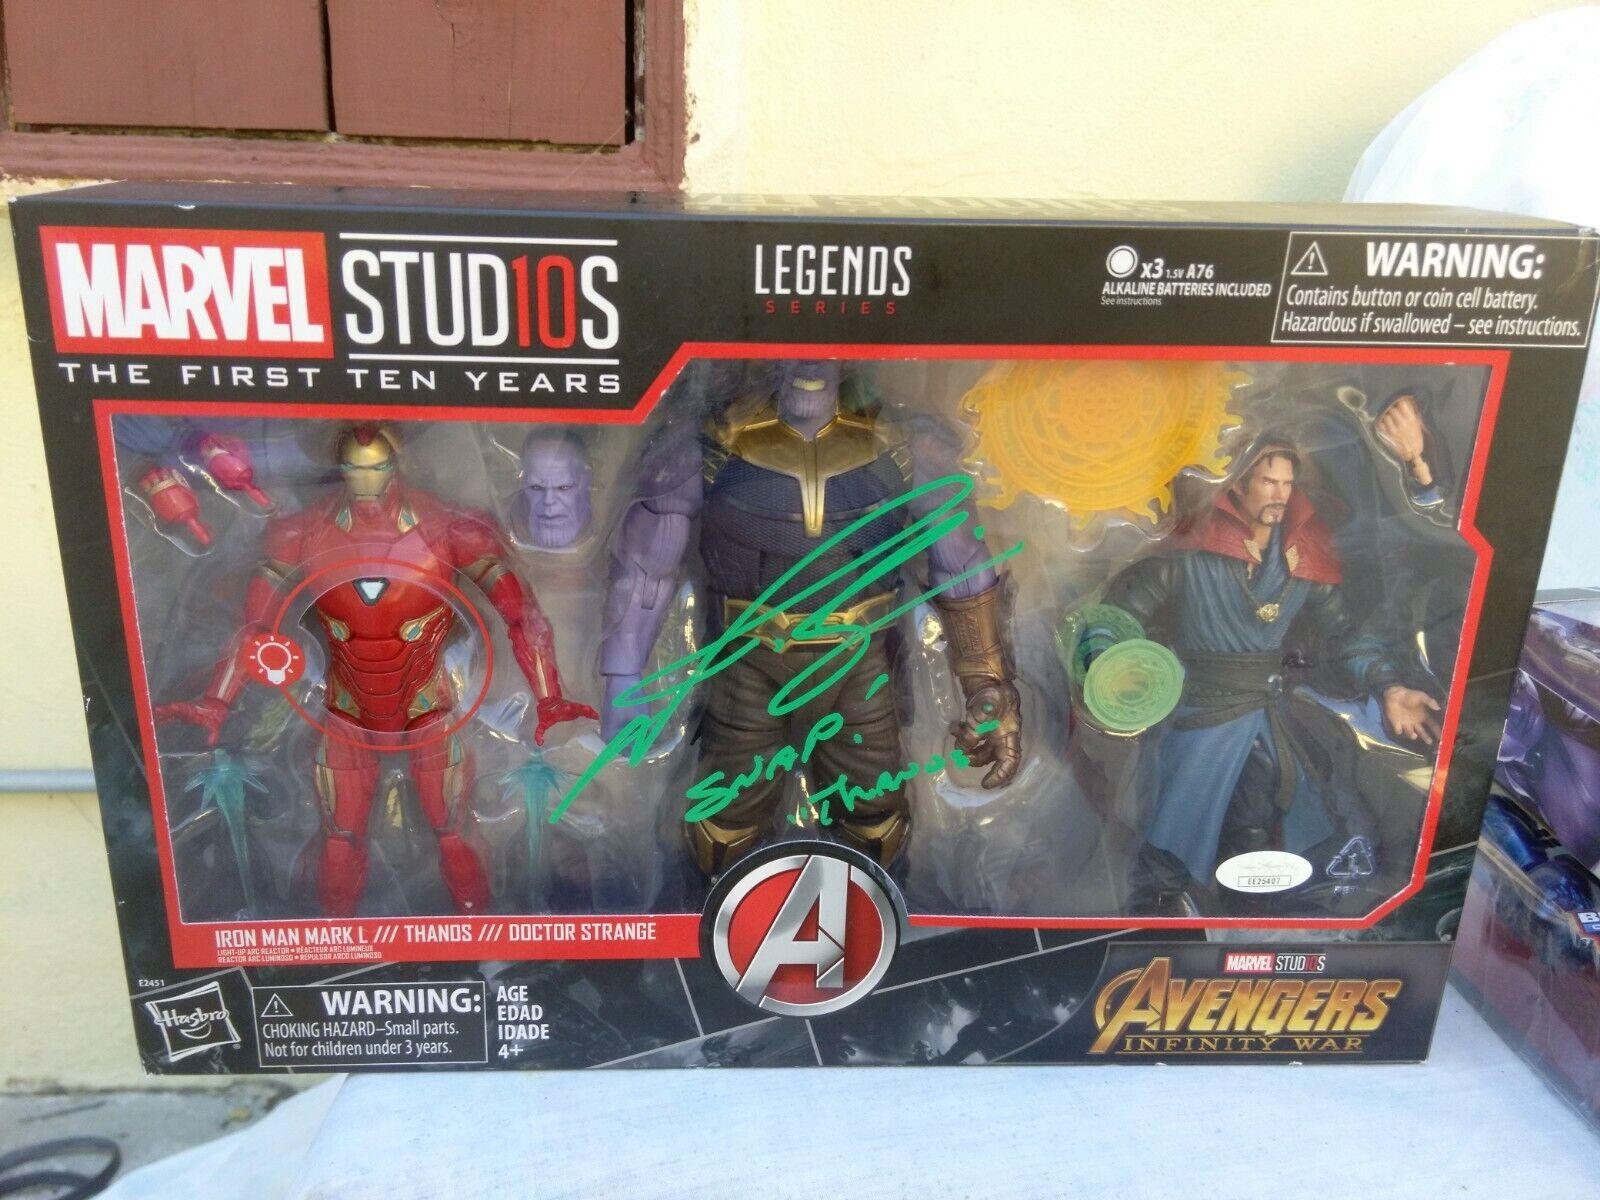 Marvel Legends Thanos firmado Josh Brolin Vengadores Infinito Guerra diez primeros años